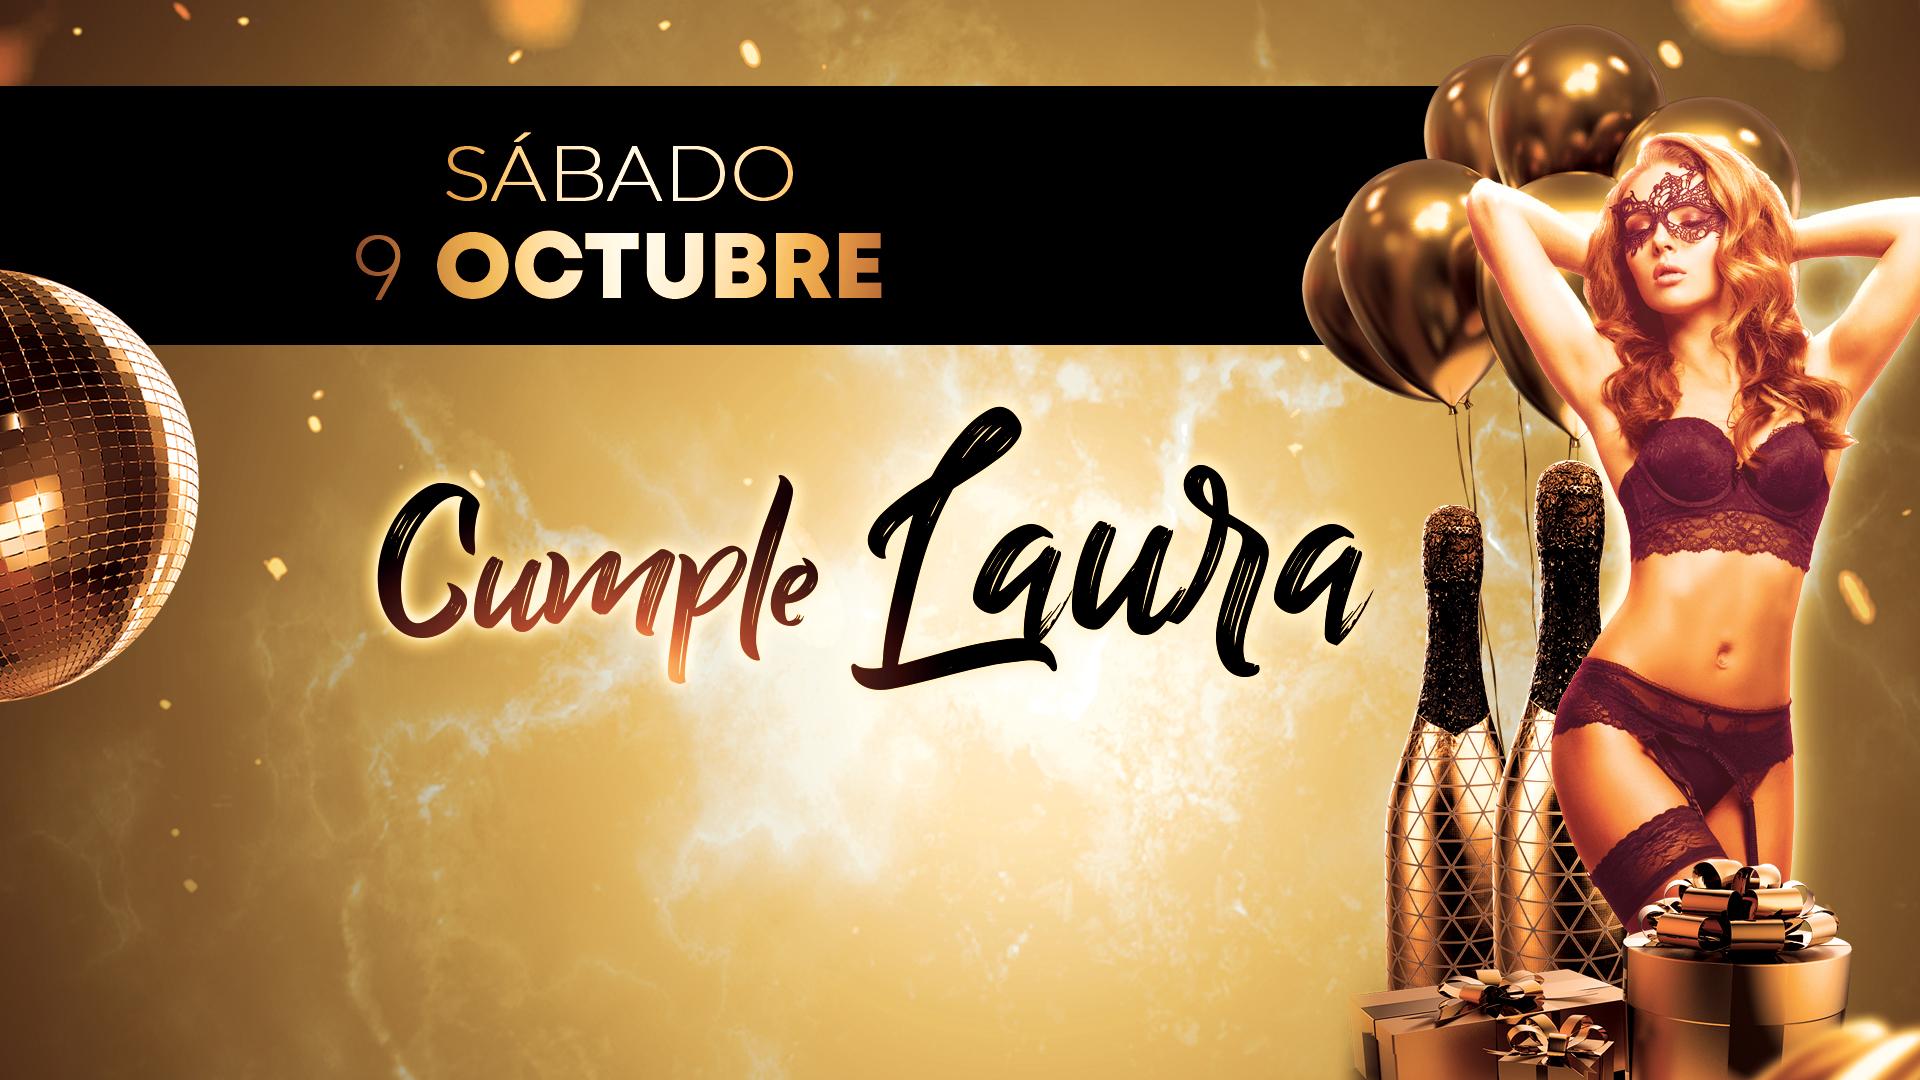 Fiesta Cumple Laura Liberal, Tentación Swinger Torremolinos